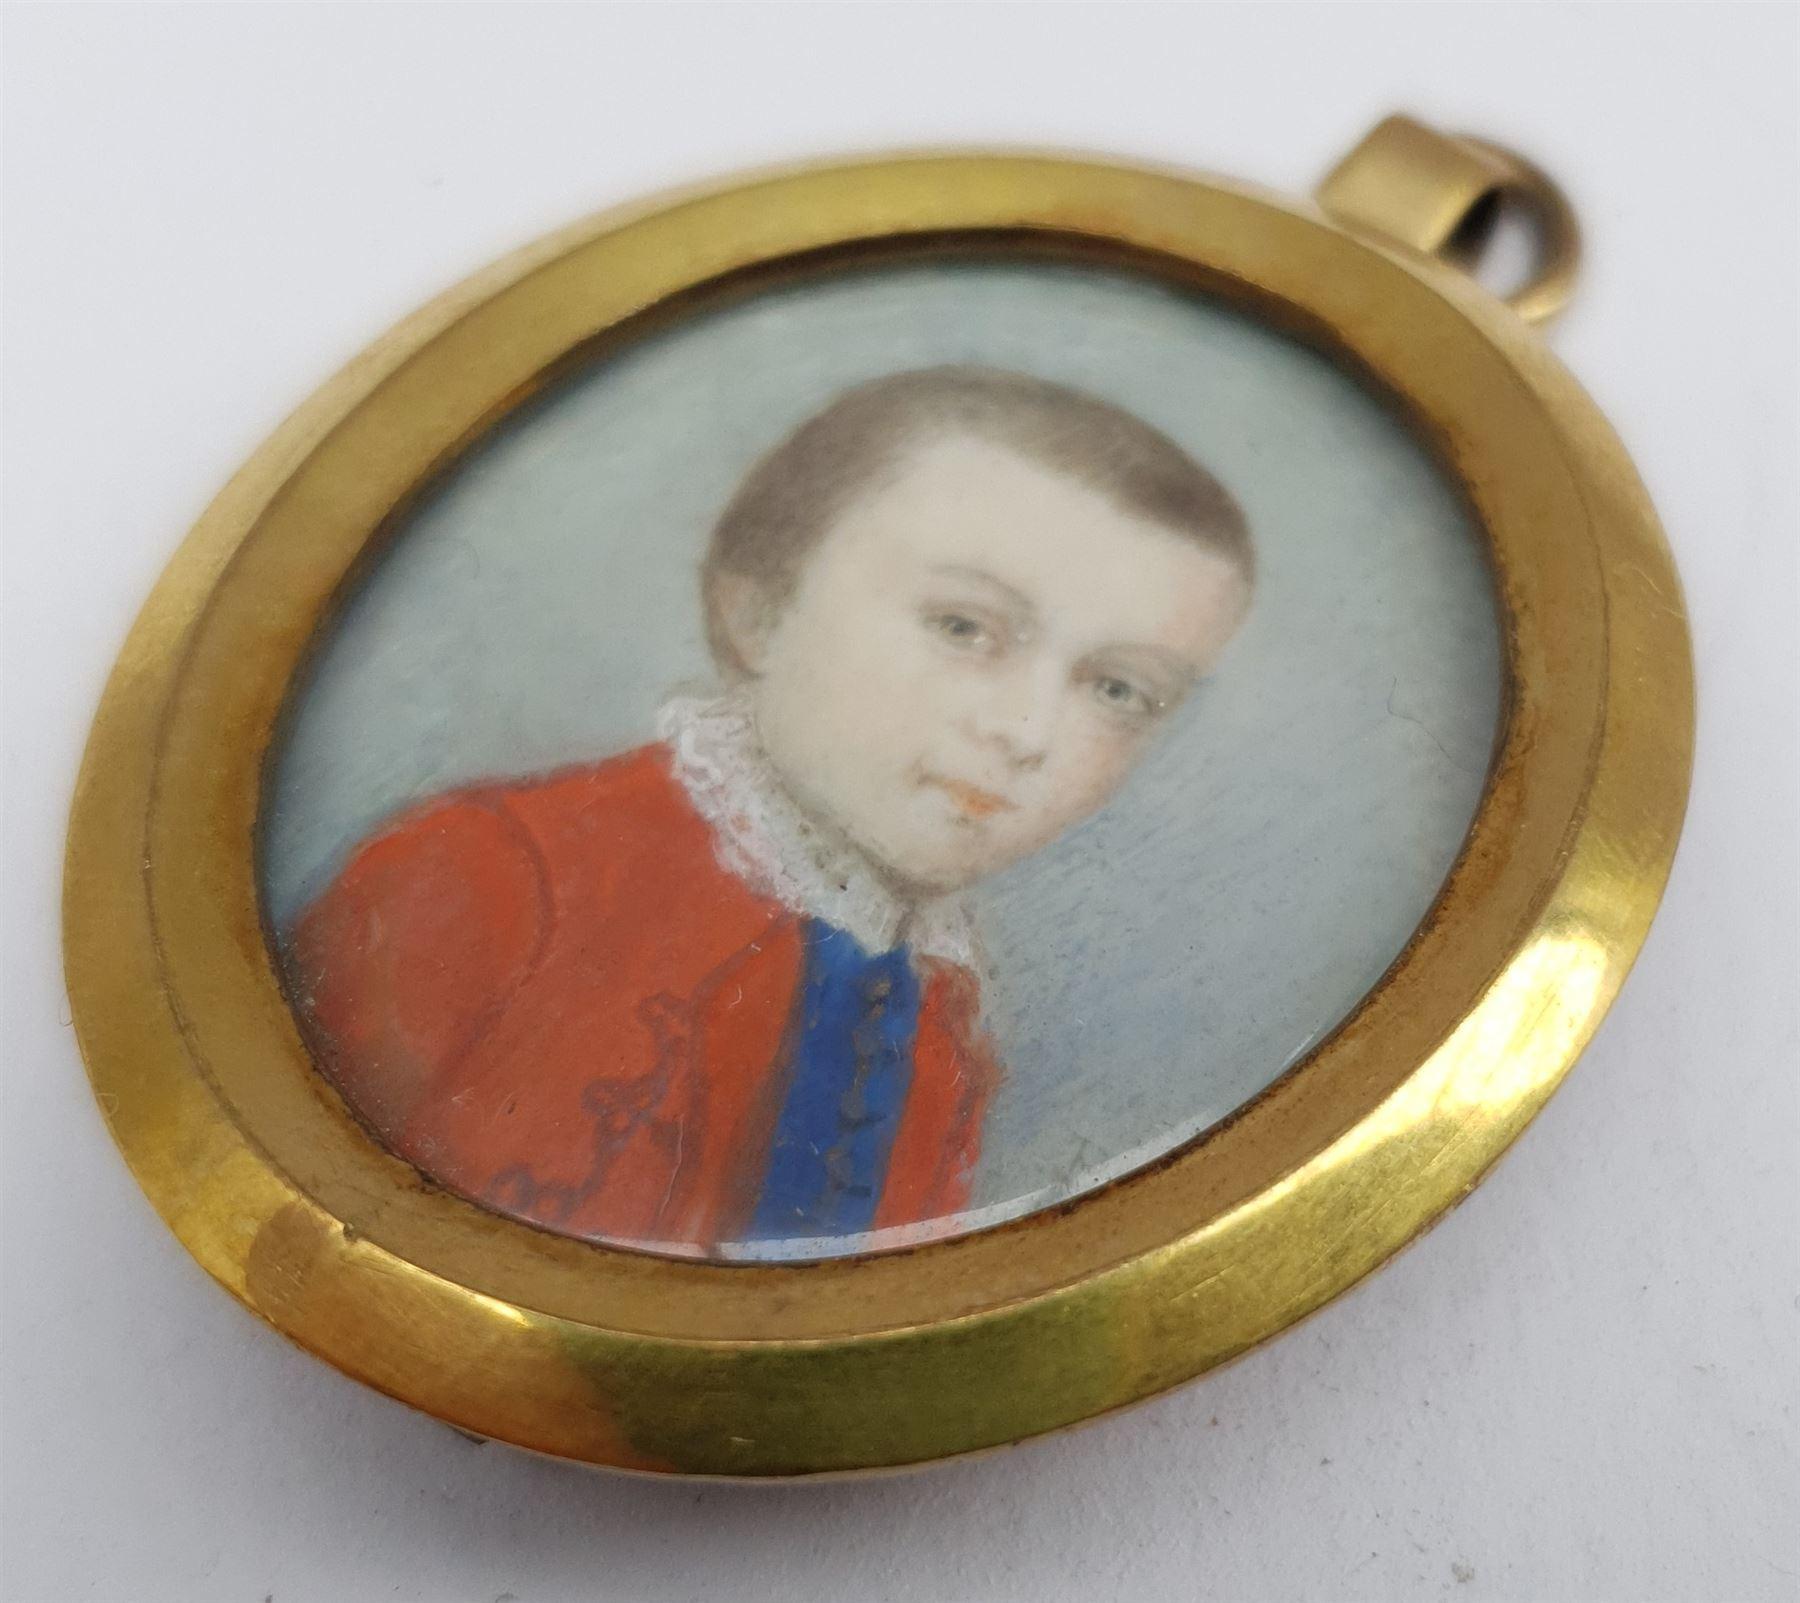 Penelope Carwardine (British 1729-1804): 'Justinian Saunders Bentley Nutt' - Image 2 of 7